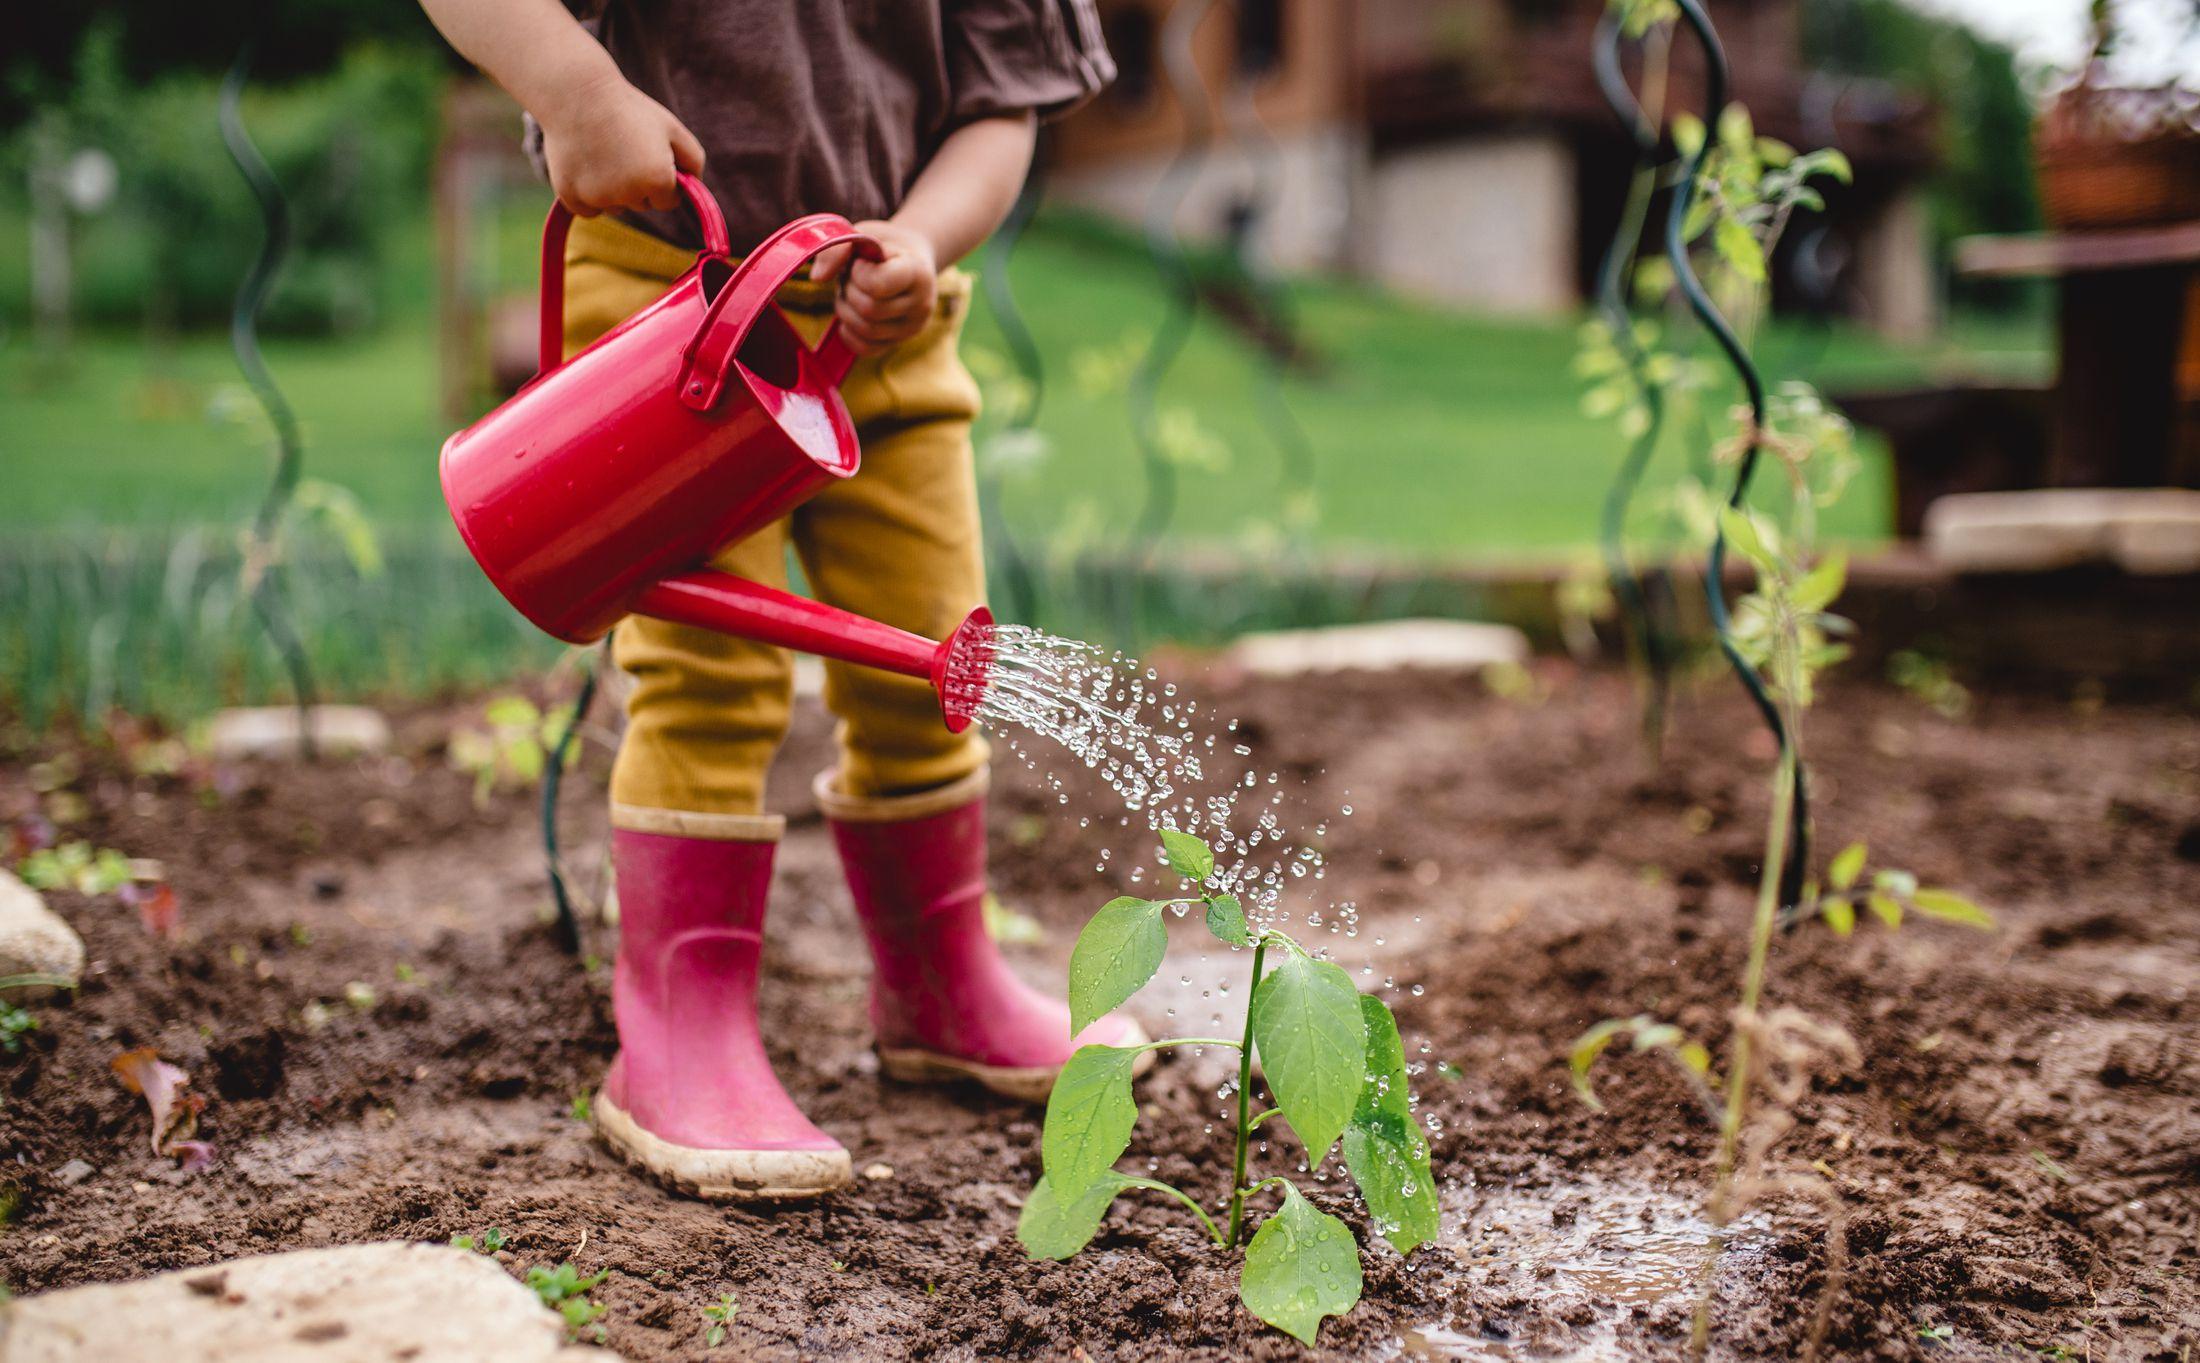 The Best Kids Gardening Tools Of 2020